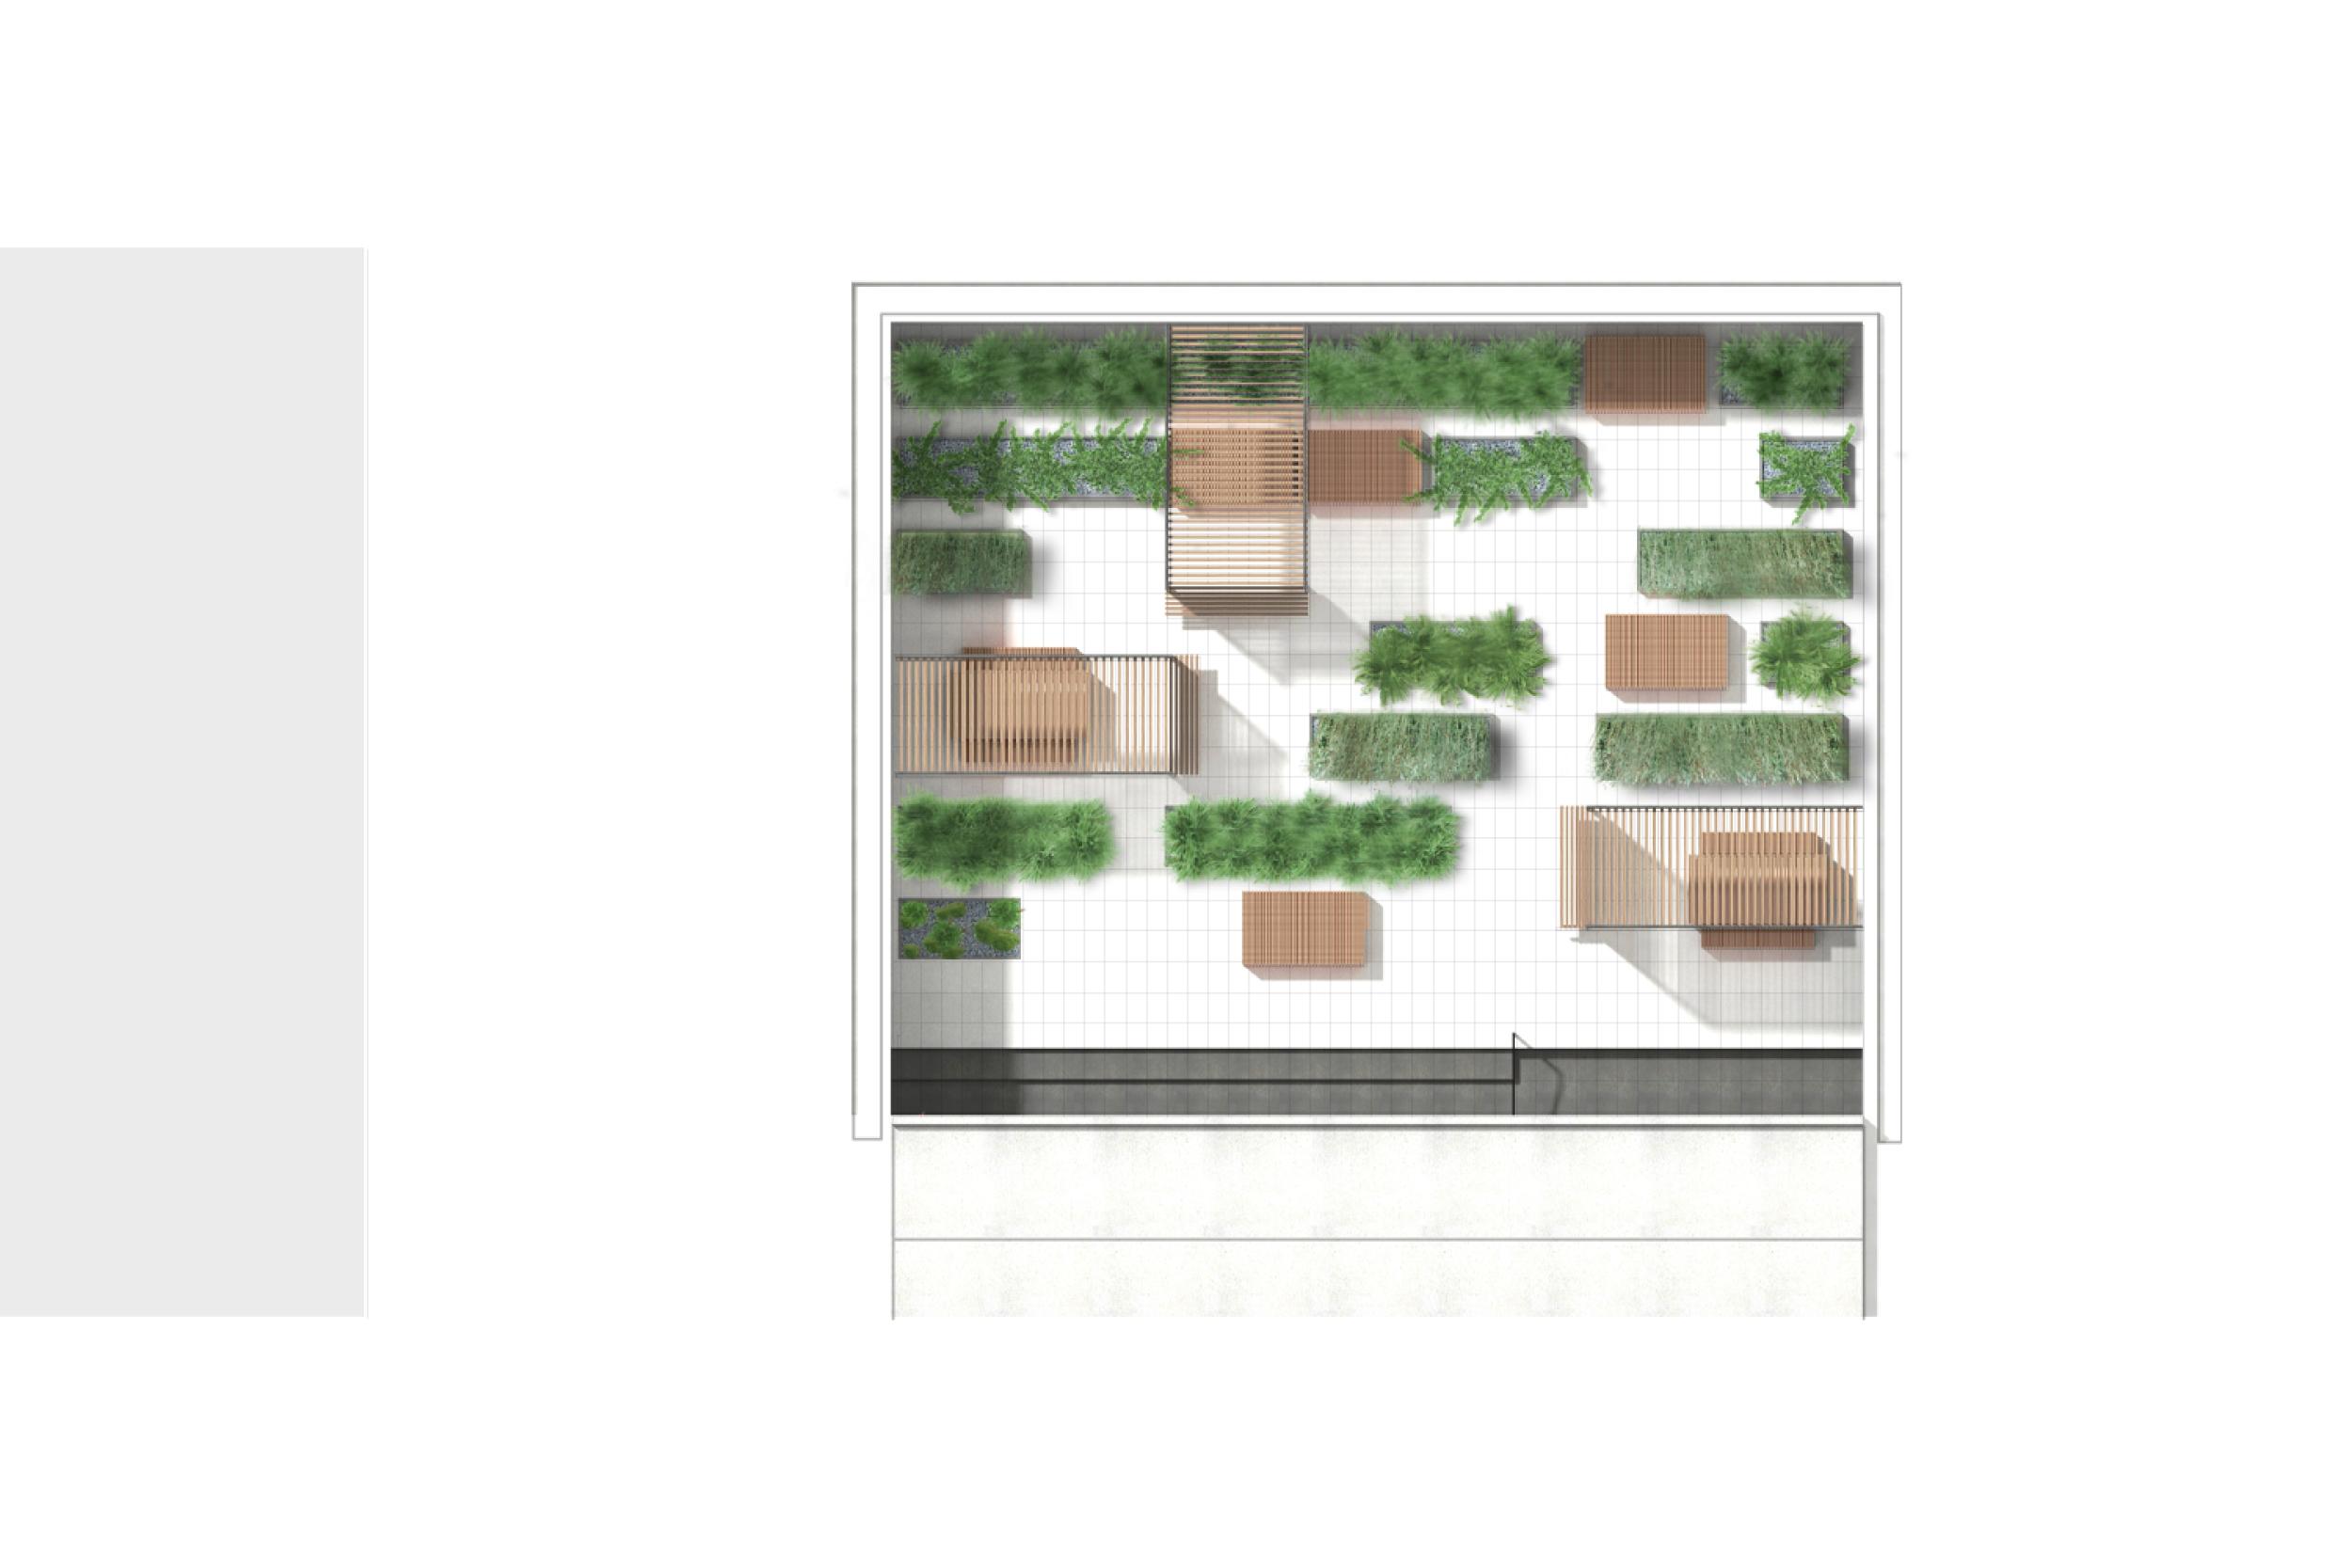 national_library_render_plan.jpg